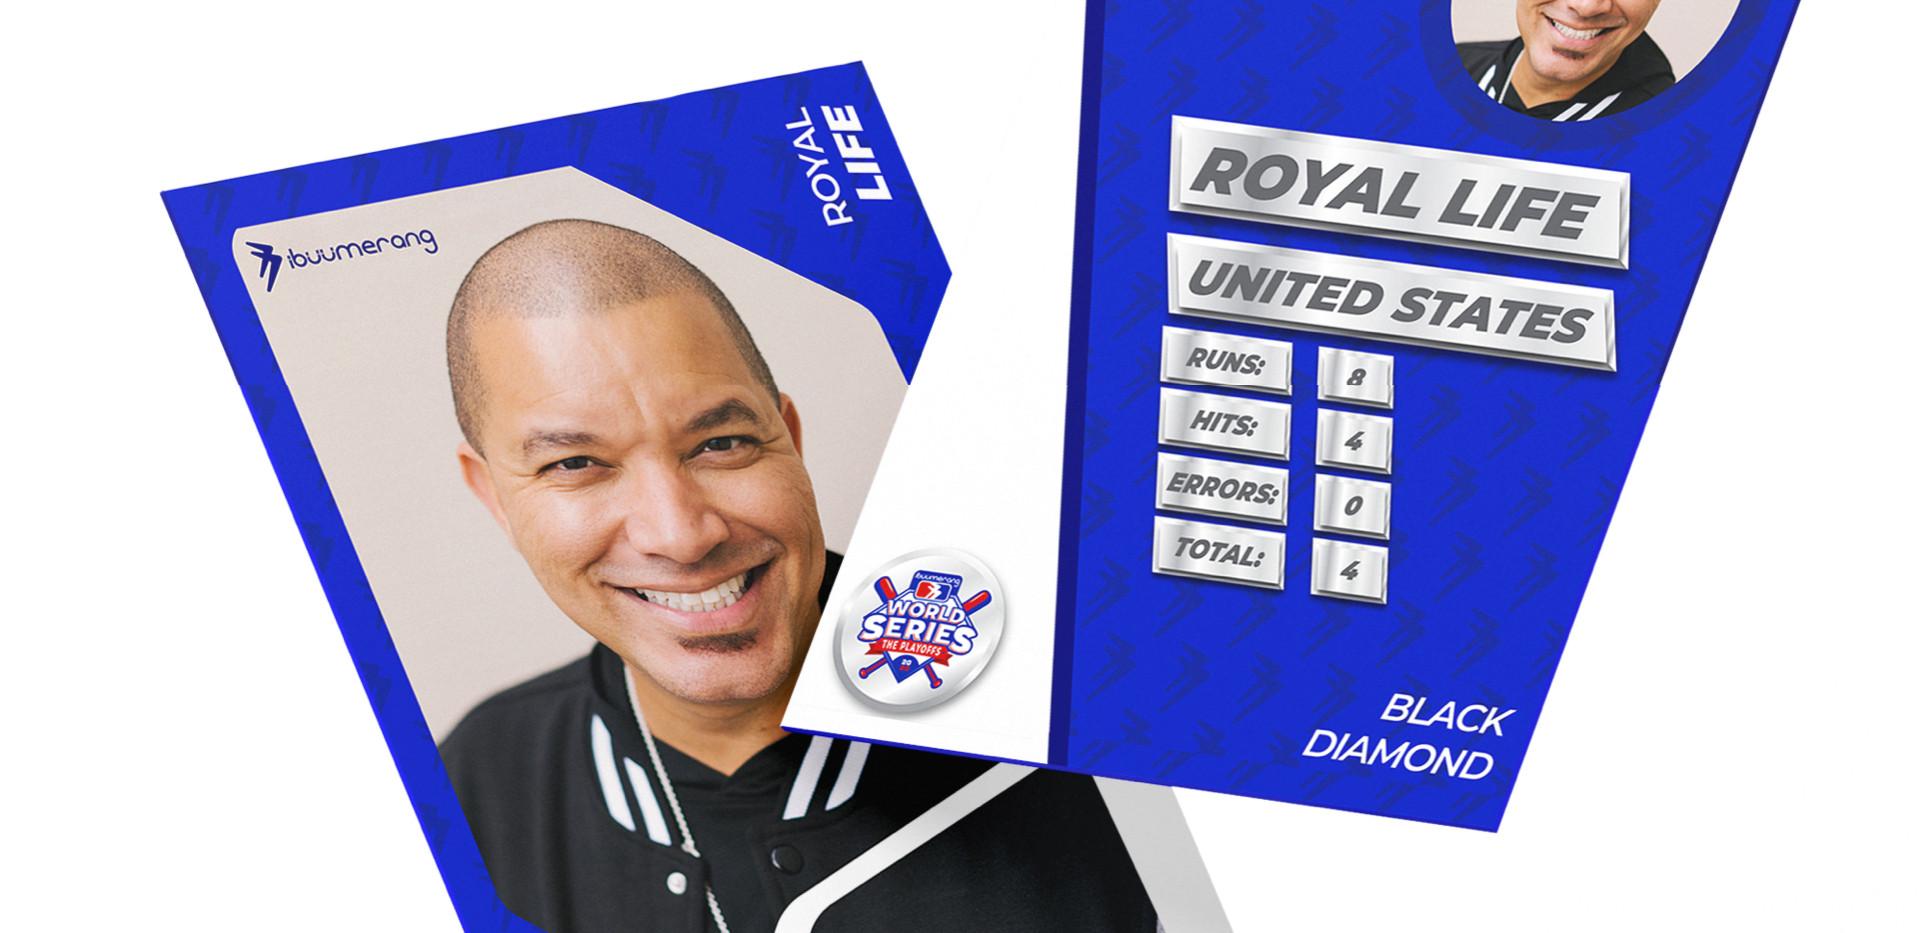 CARDS SQUARE.002.jpeg